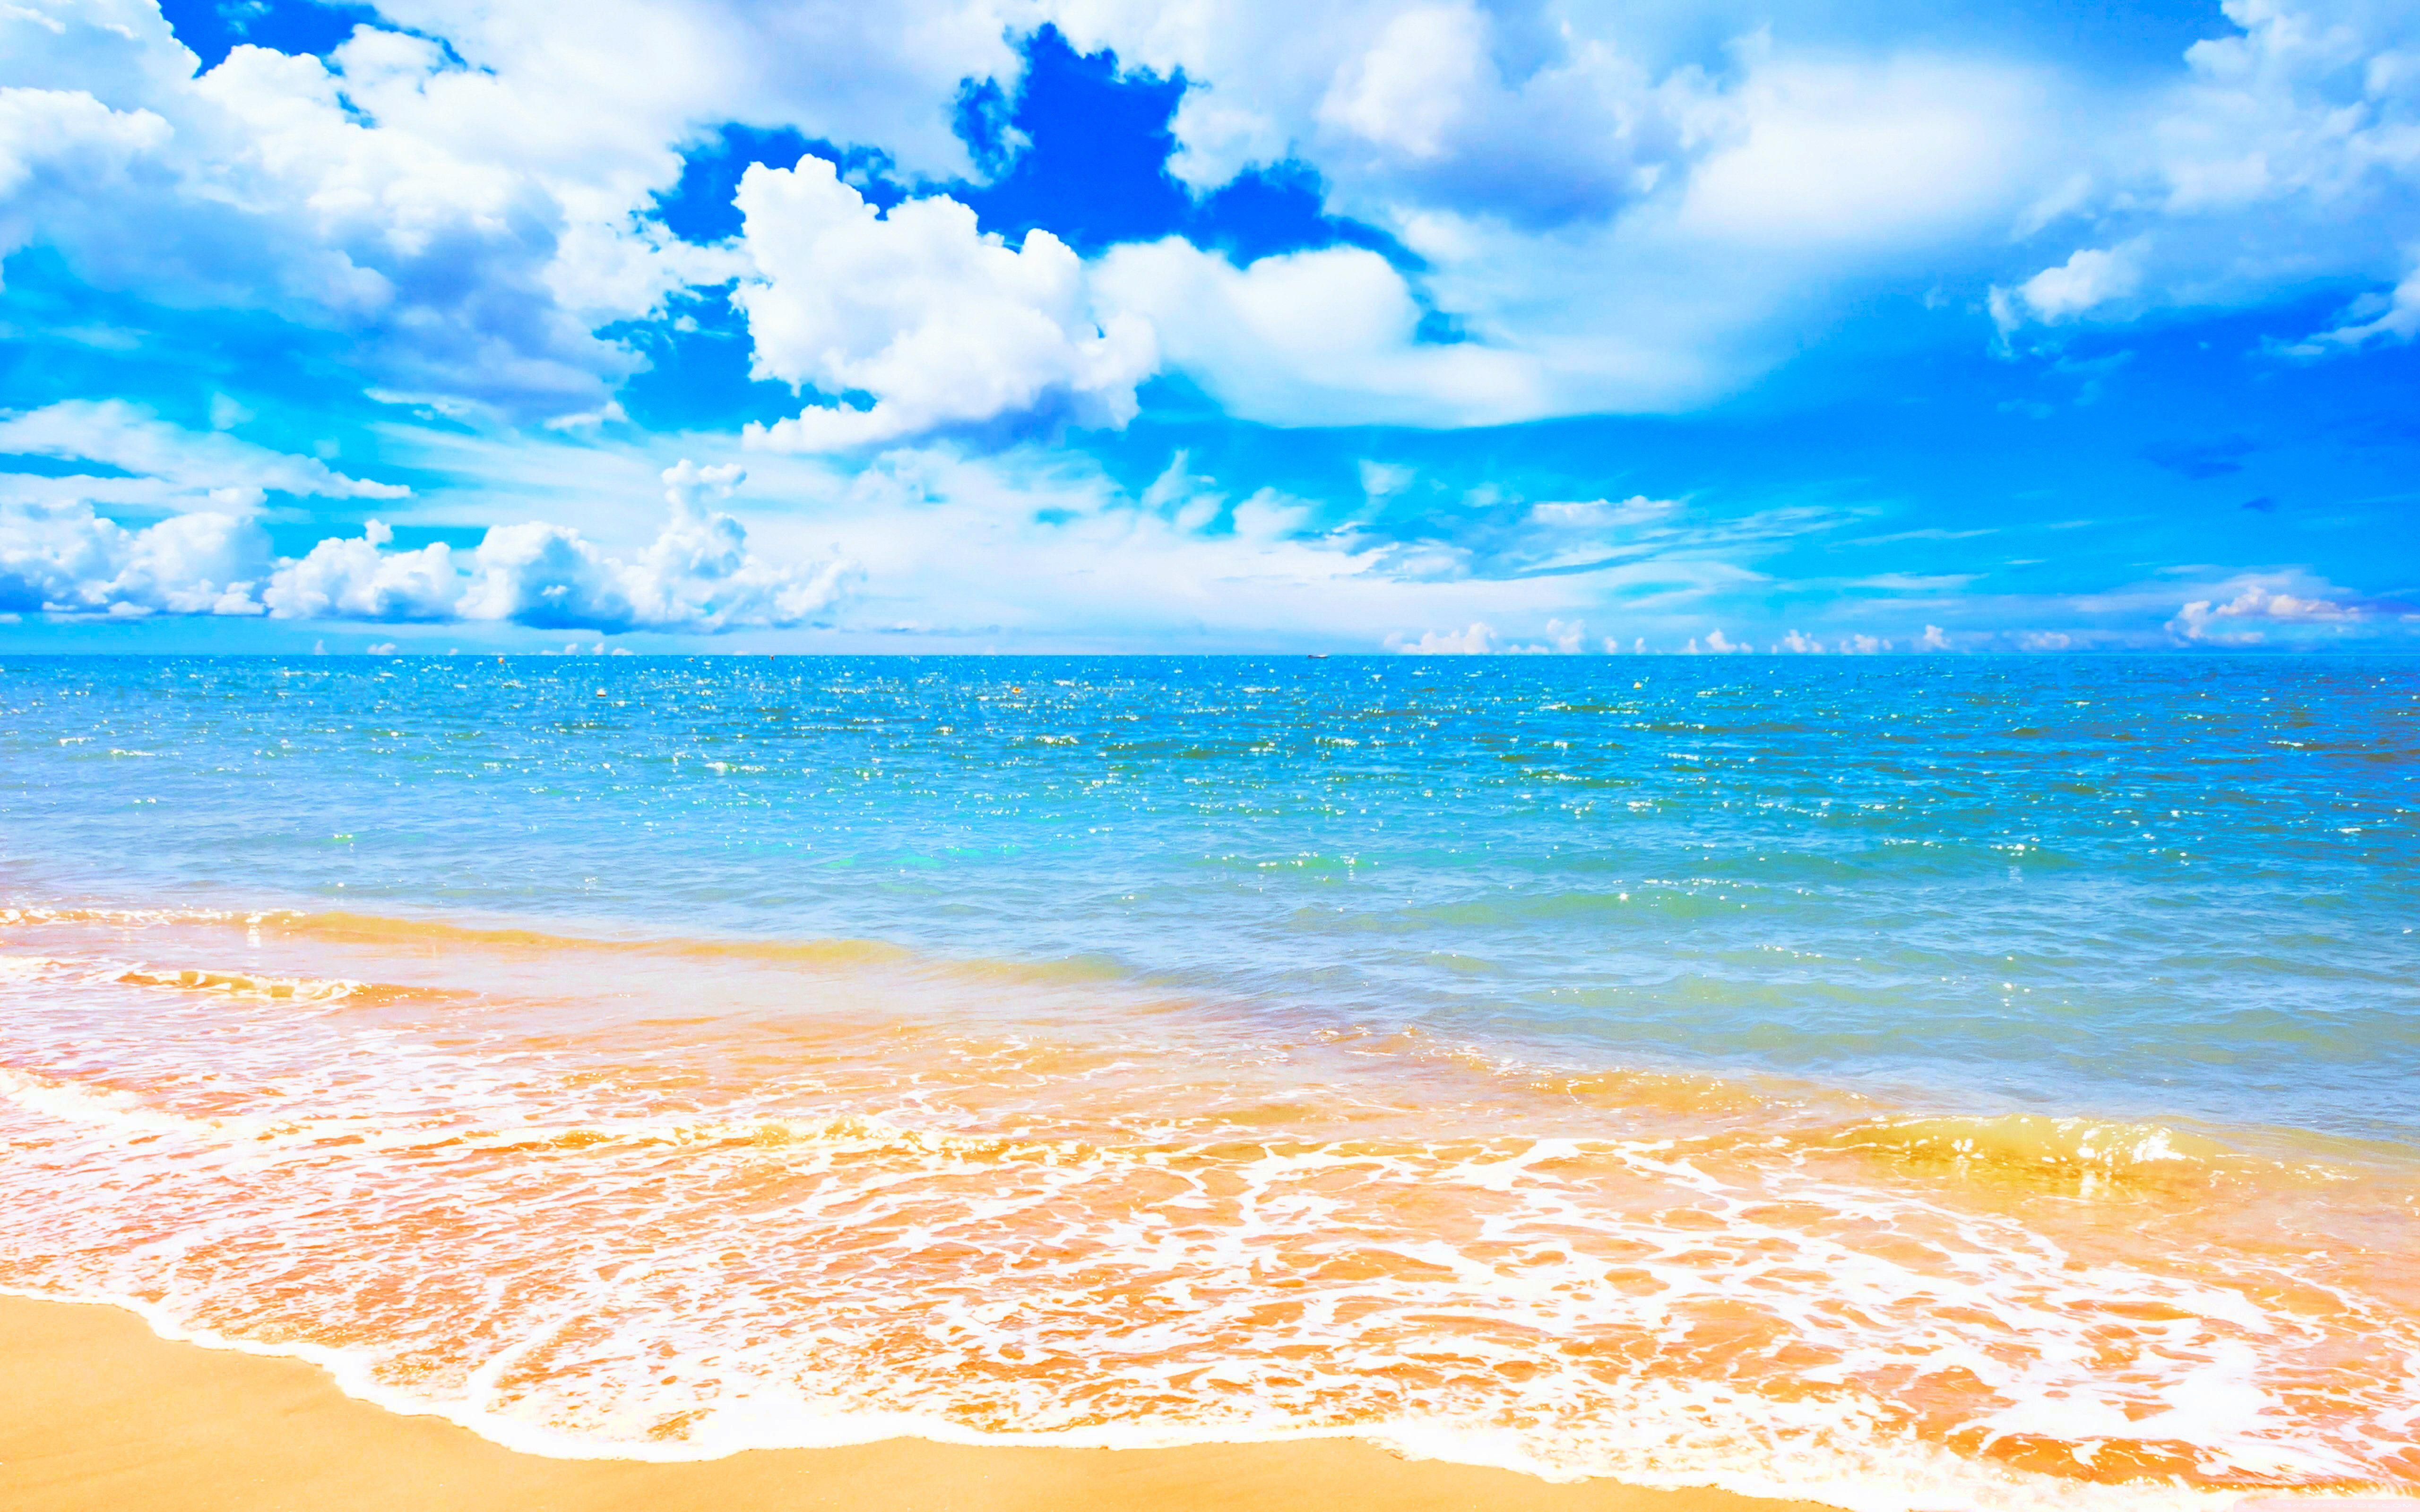 1494 Beach HD Wallpapers | Backgrounds - Wallpaper Abyss